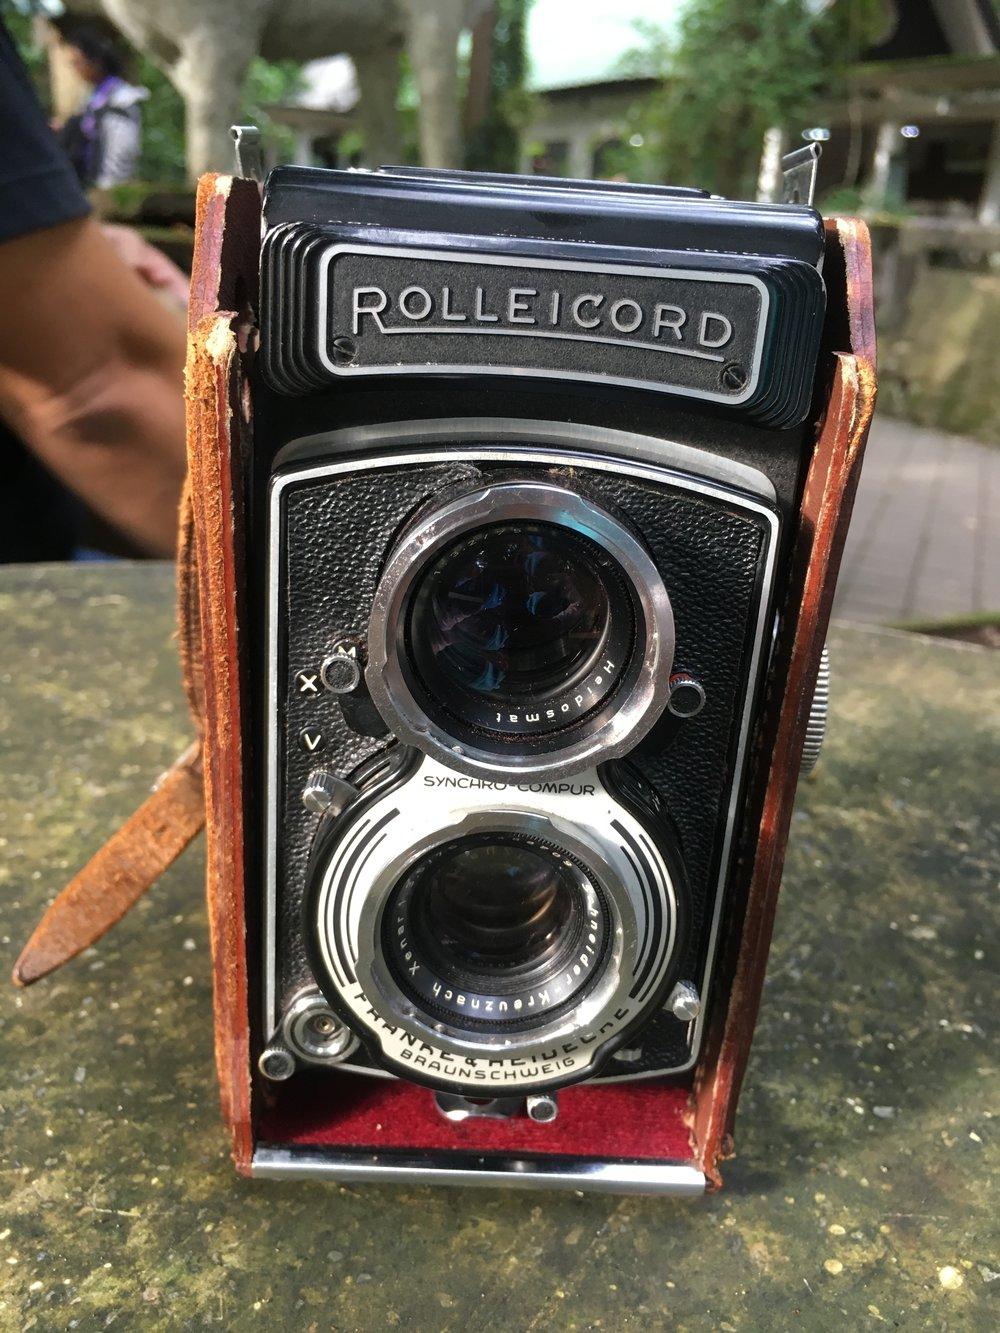 Vintage Rolleicord Camera